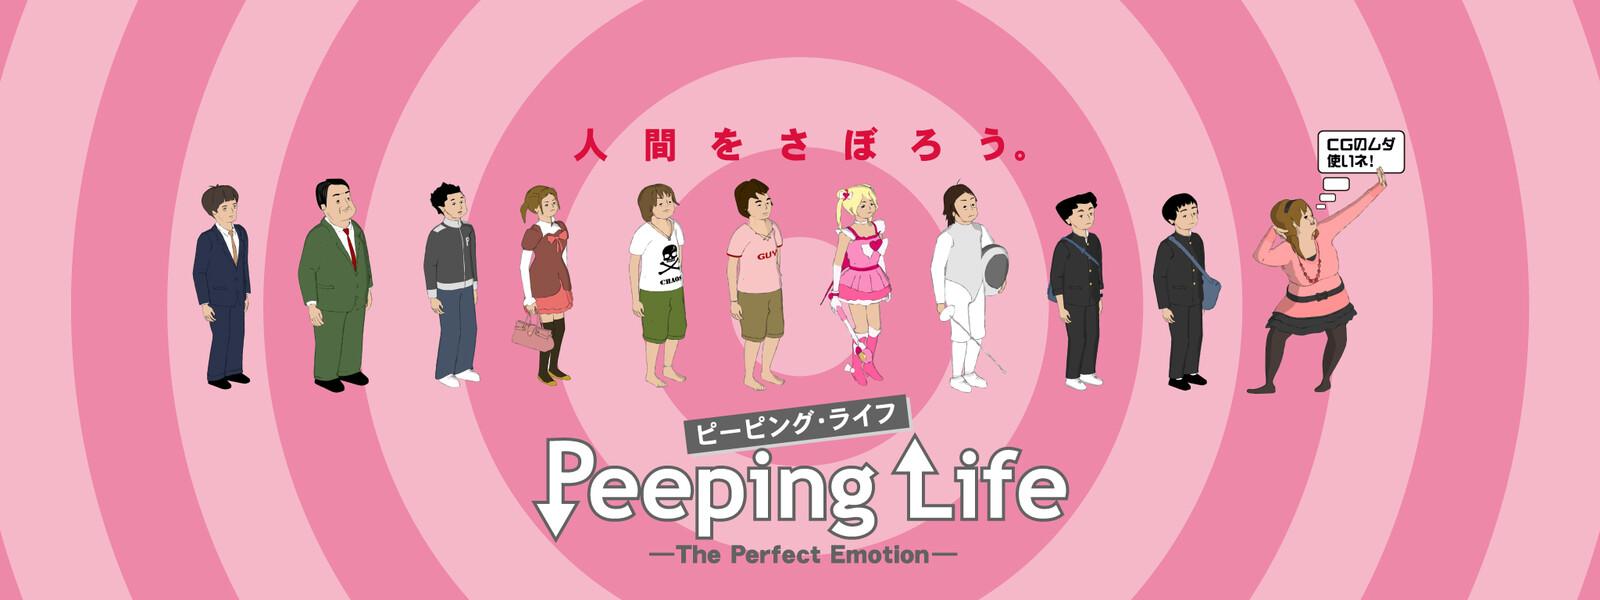 Peeping Life (ピーピング・ライフ) -The Perfect Edition-  ピンク盤の動画 - Peeping Life (ピーピング・ライフ) -WE ARE THE HERO-